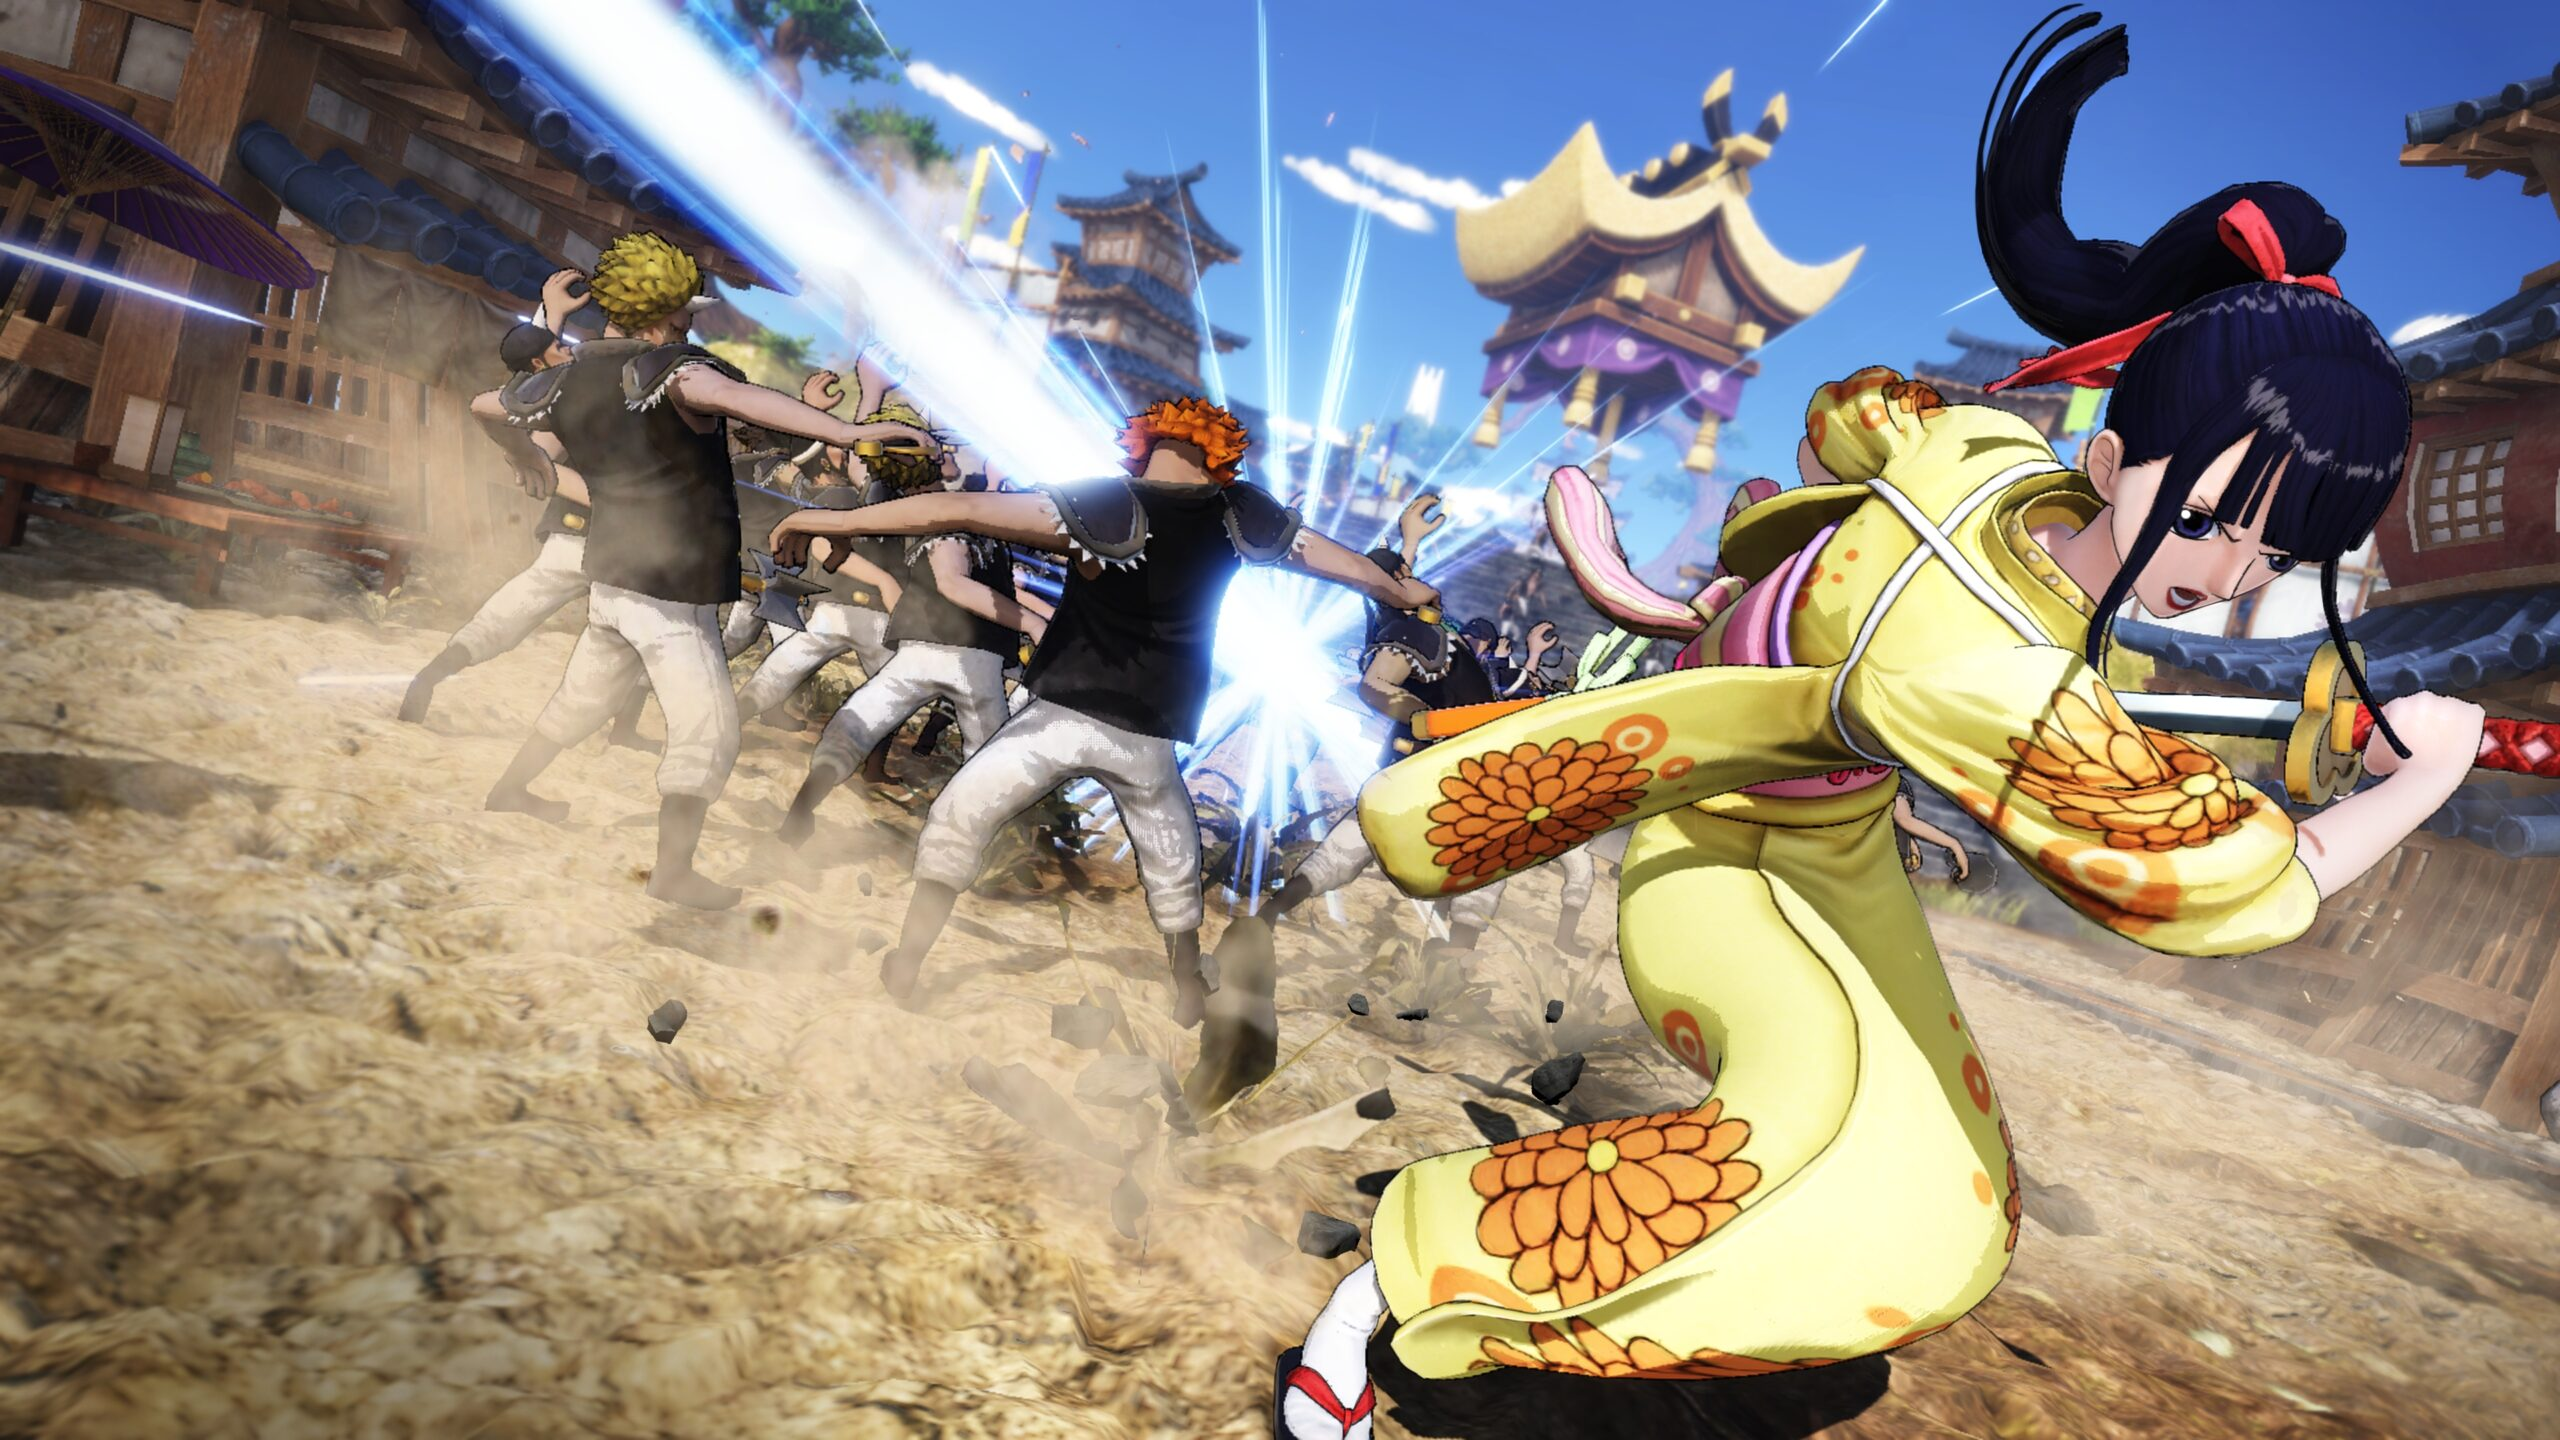 One-Piece-Pirate-Warriors-4_2020_11-15-20_002